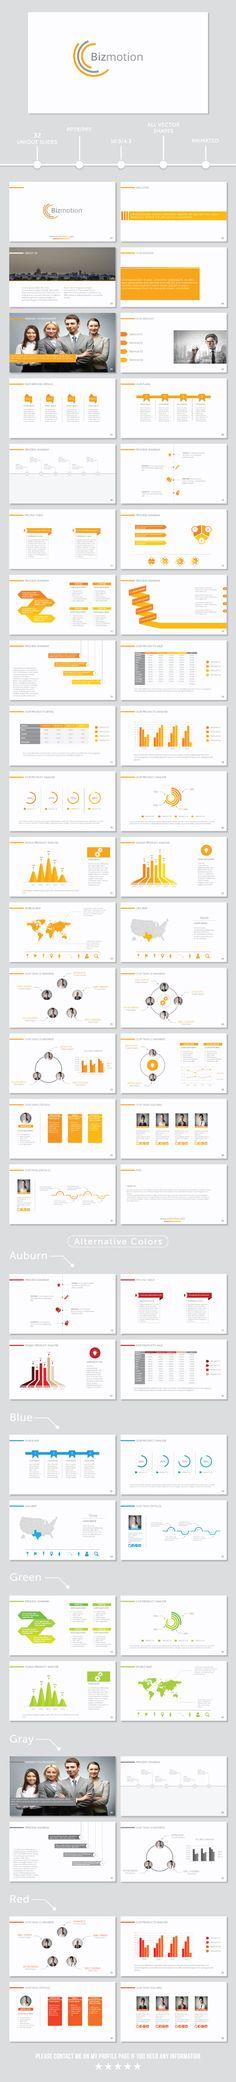 BizMotion PowerPoint Presentation Template #infographic #portfolio #sleek • Click here to download ! http://graphicriver.net/item/bizmotion-powerpoint-presentation-template/10565383?s_rank=668&ref=pxcr